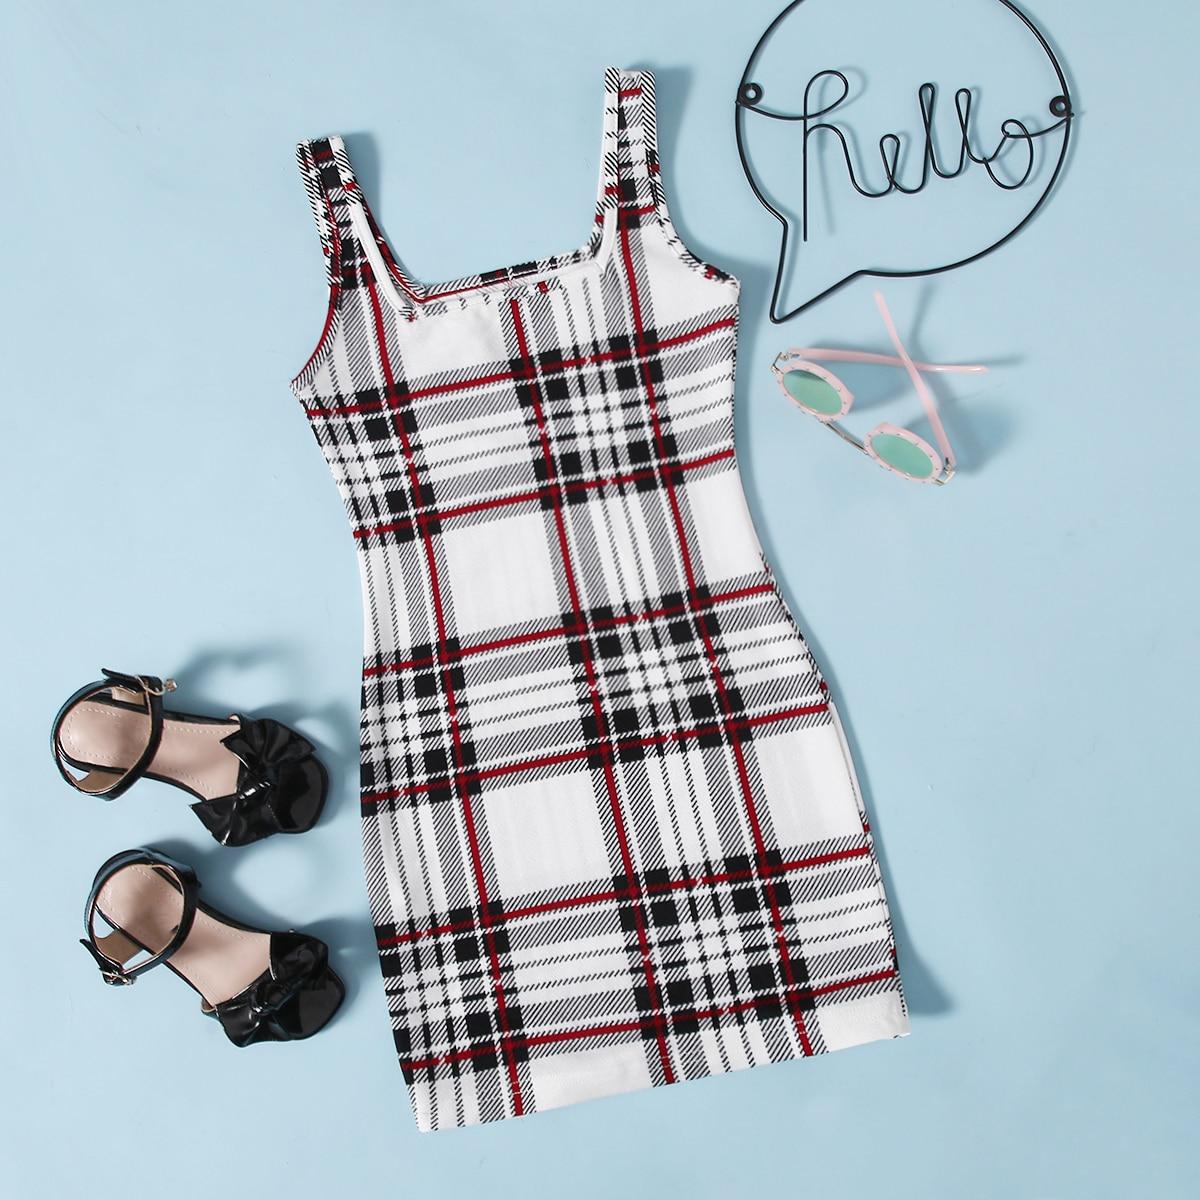 Ärmelloses Kleid mit Karo Muster